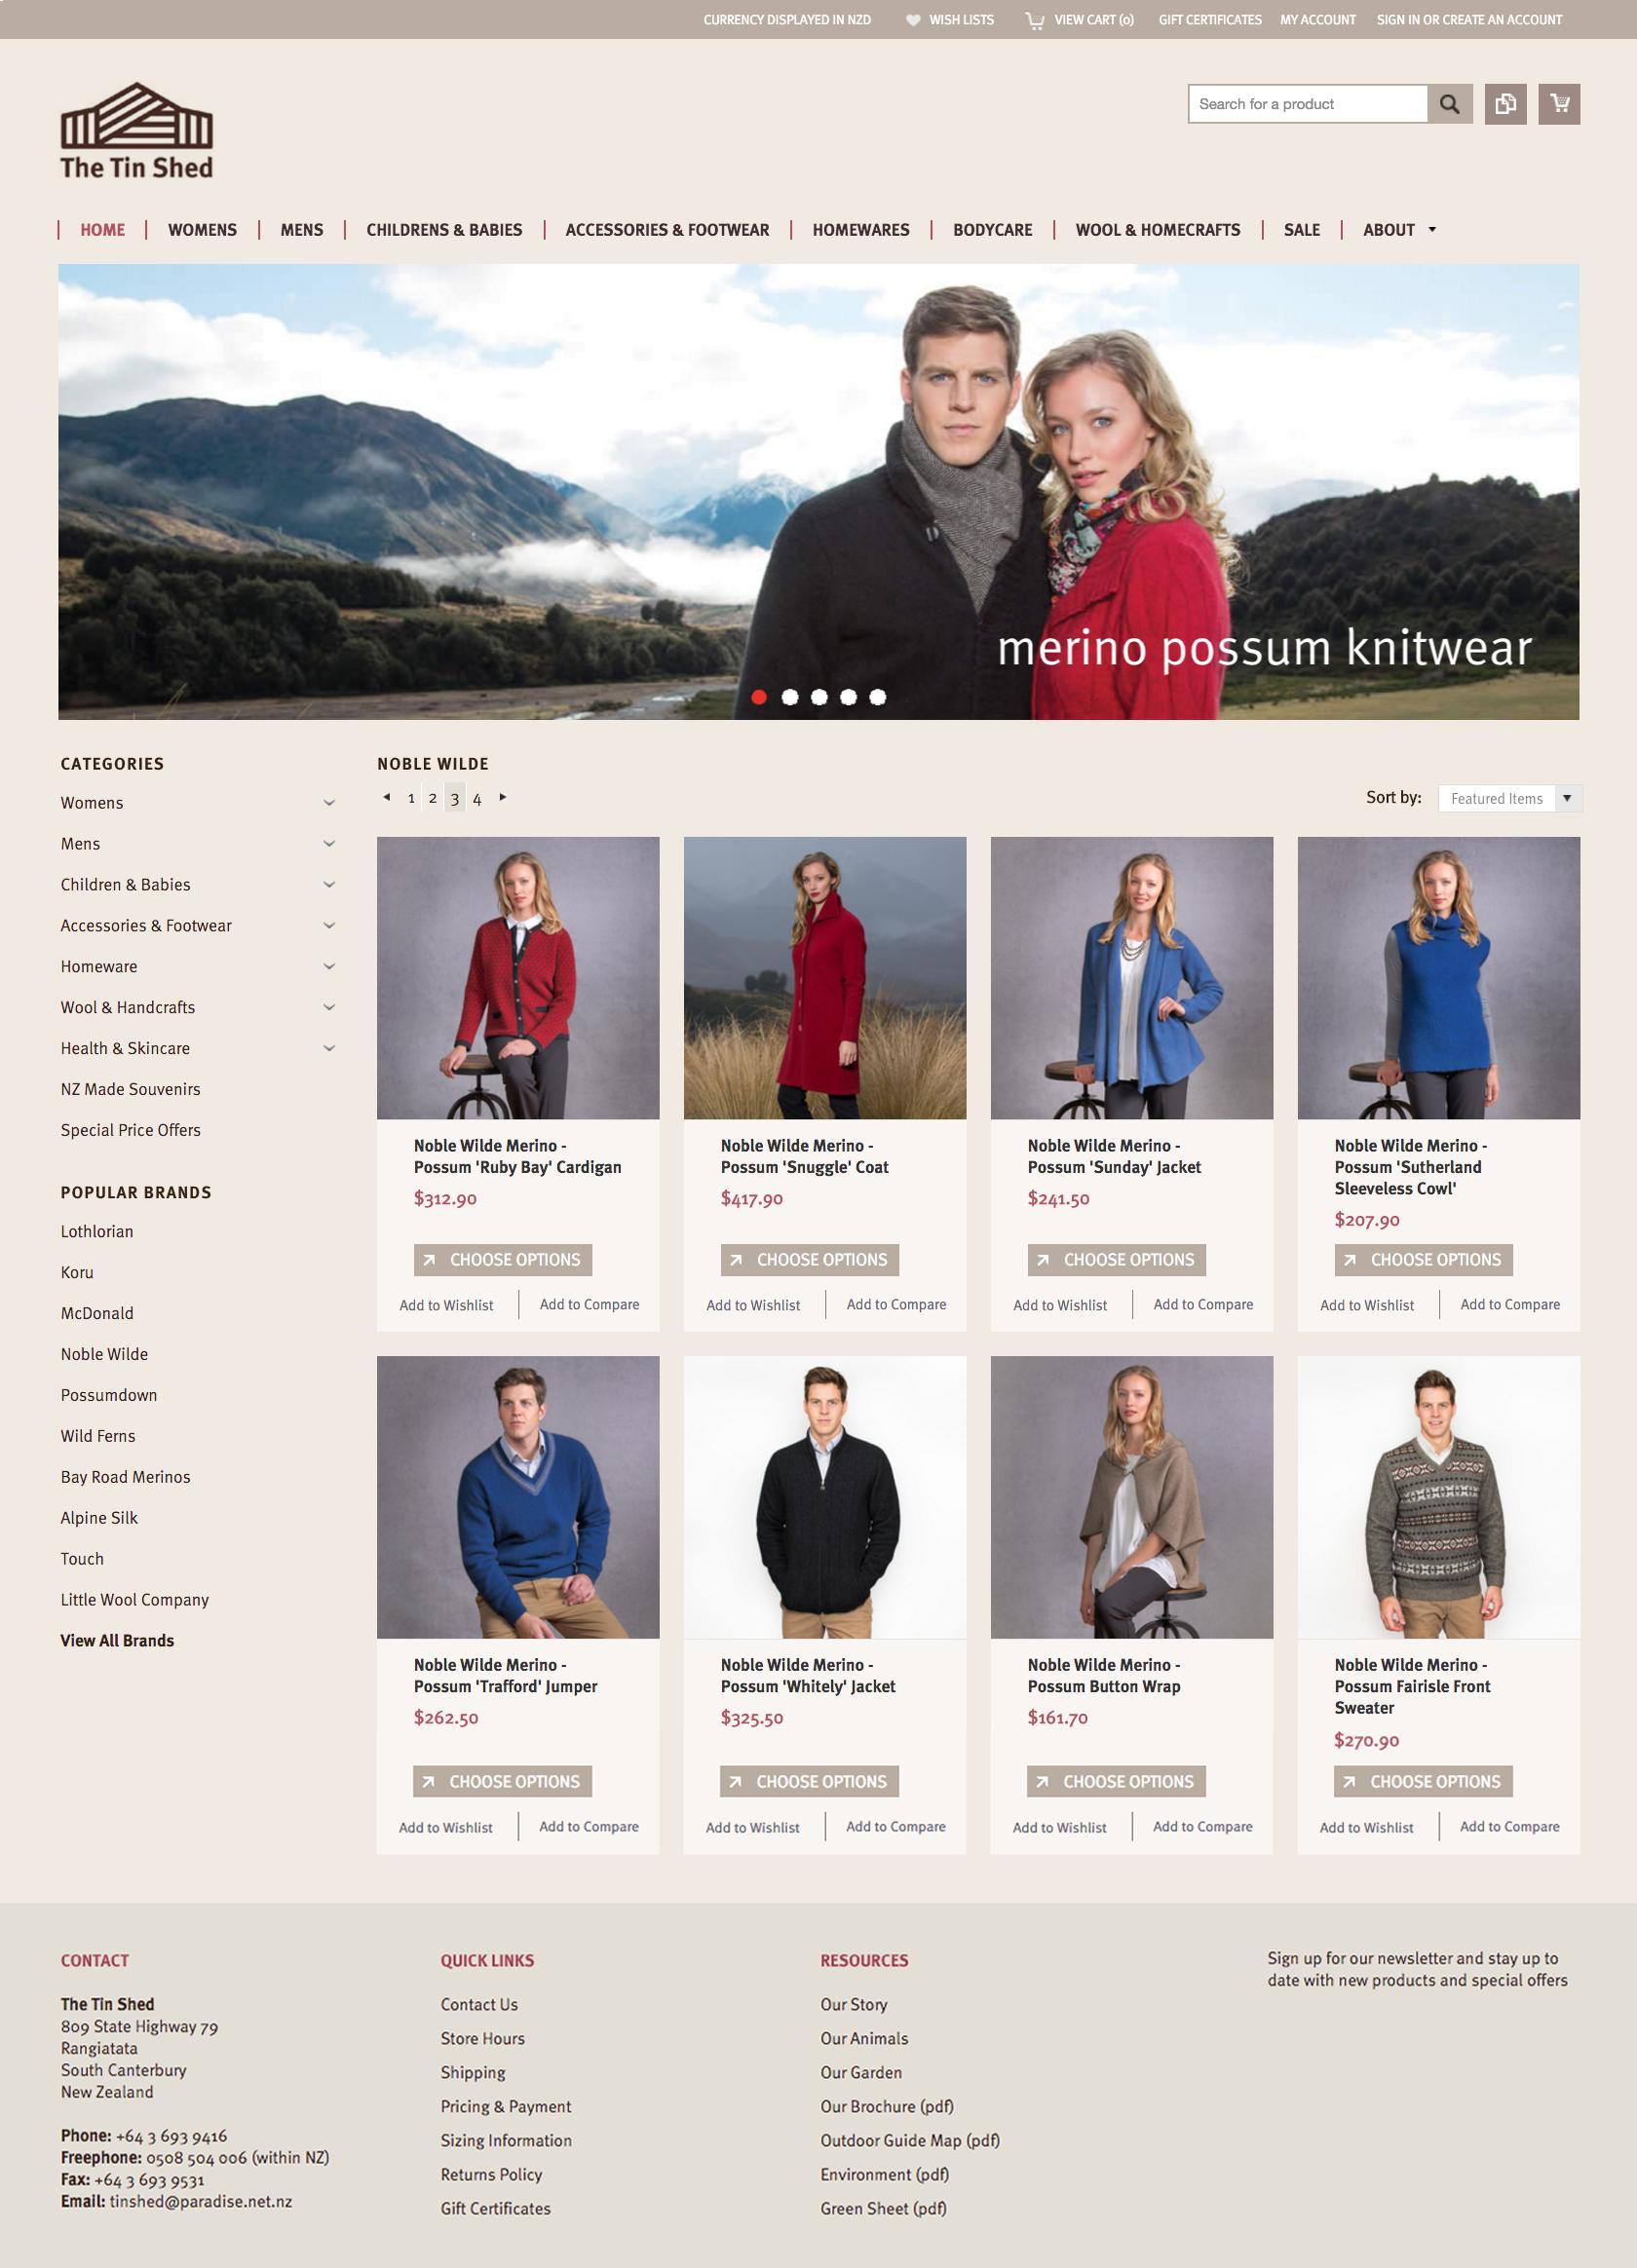 The Tin Shed – Fashion retailer